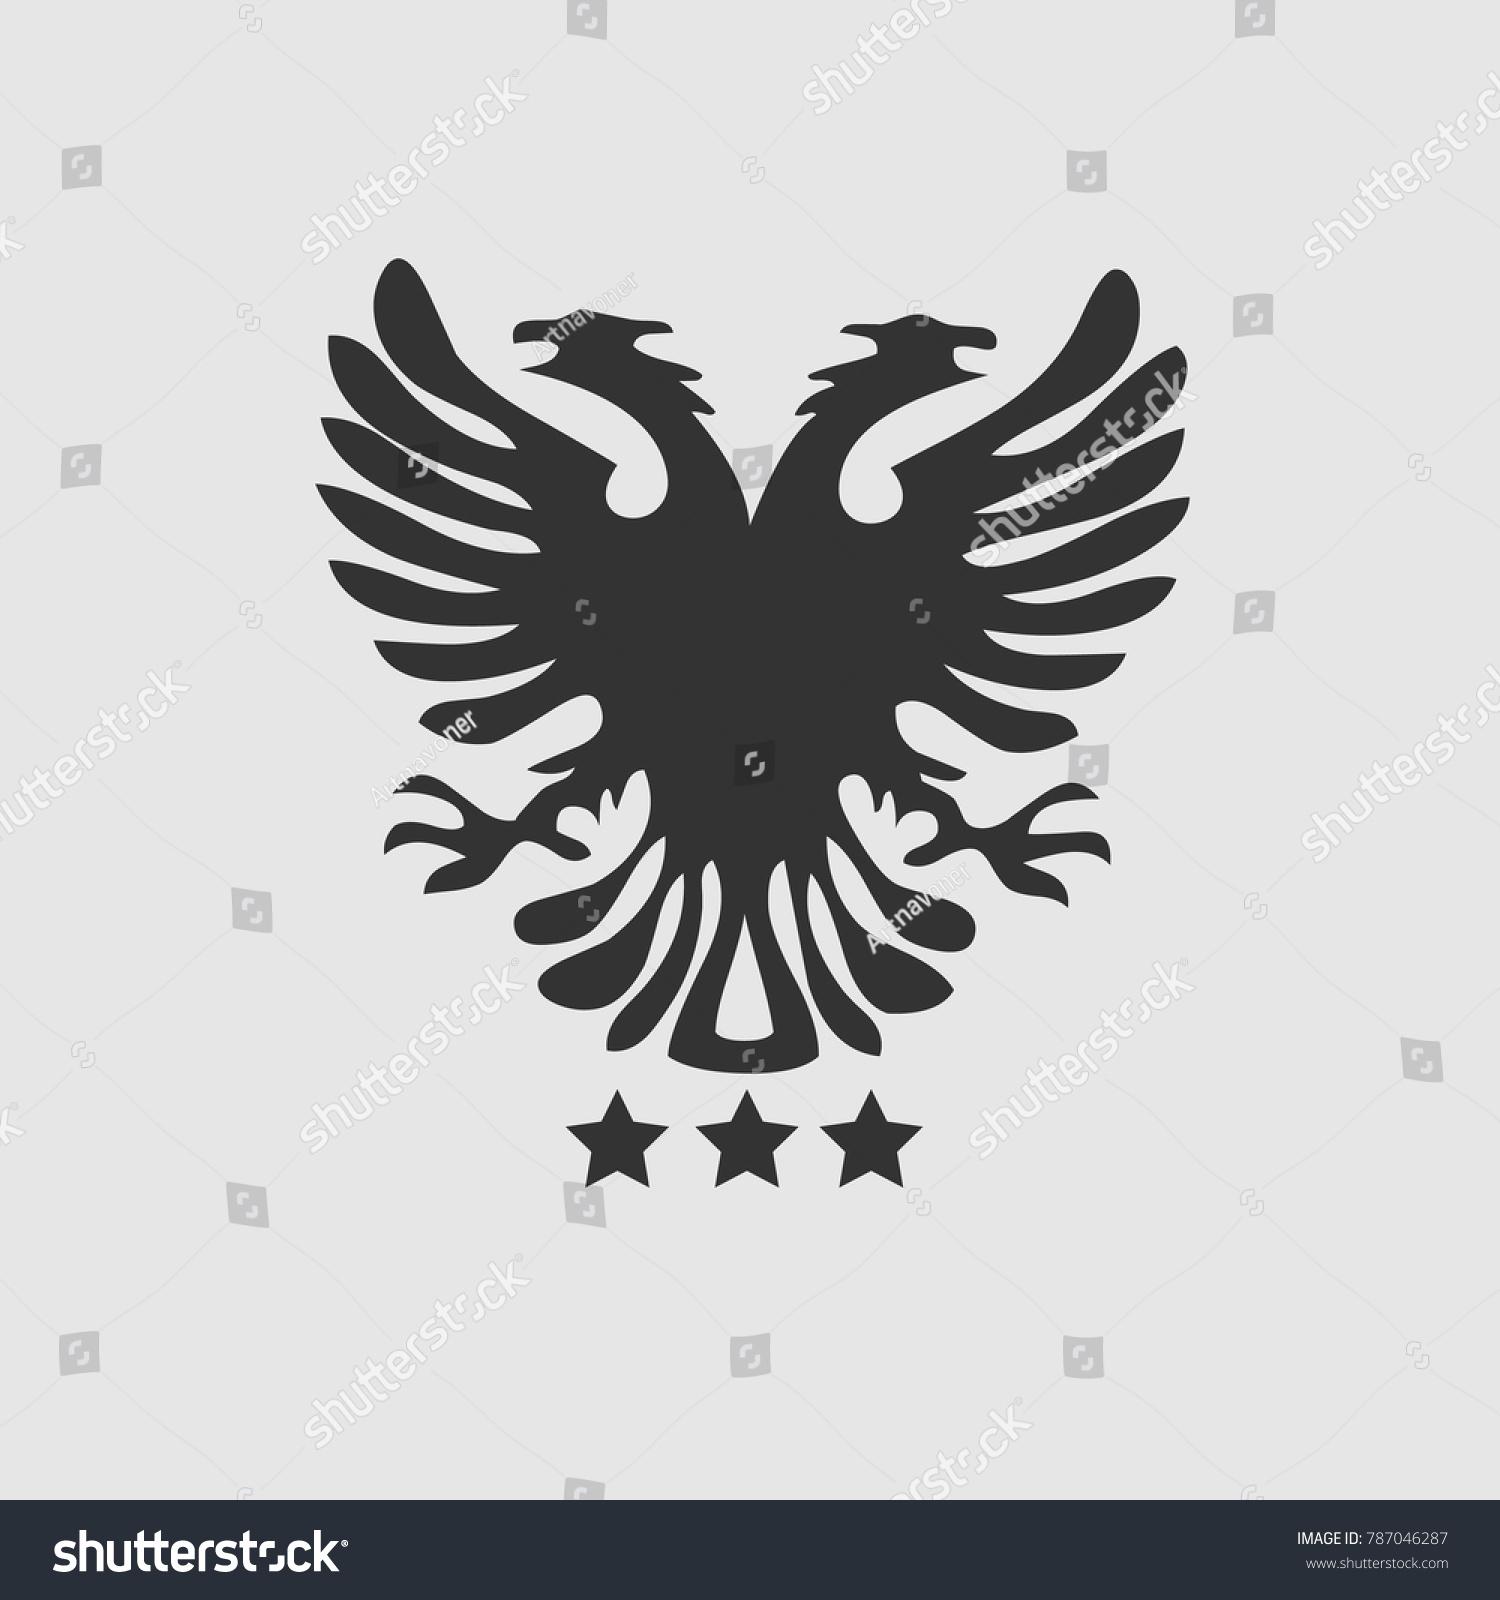 Eagle Symbol Three Stars Stock Vector Royalty Free 787046287